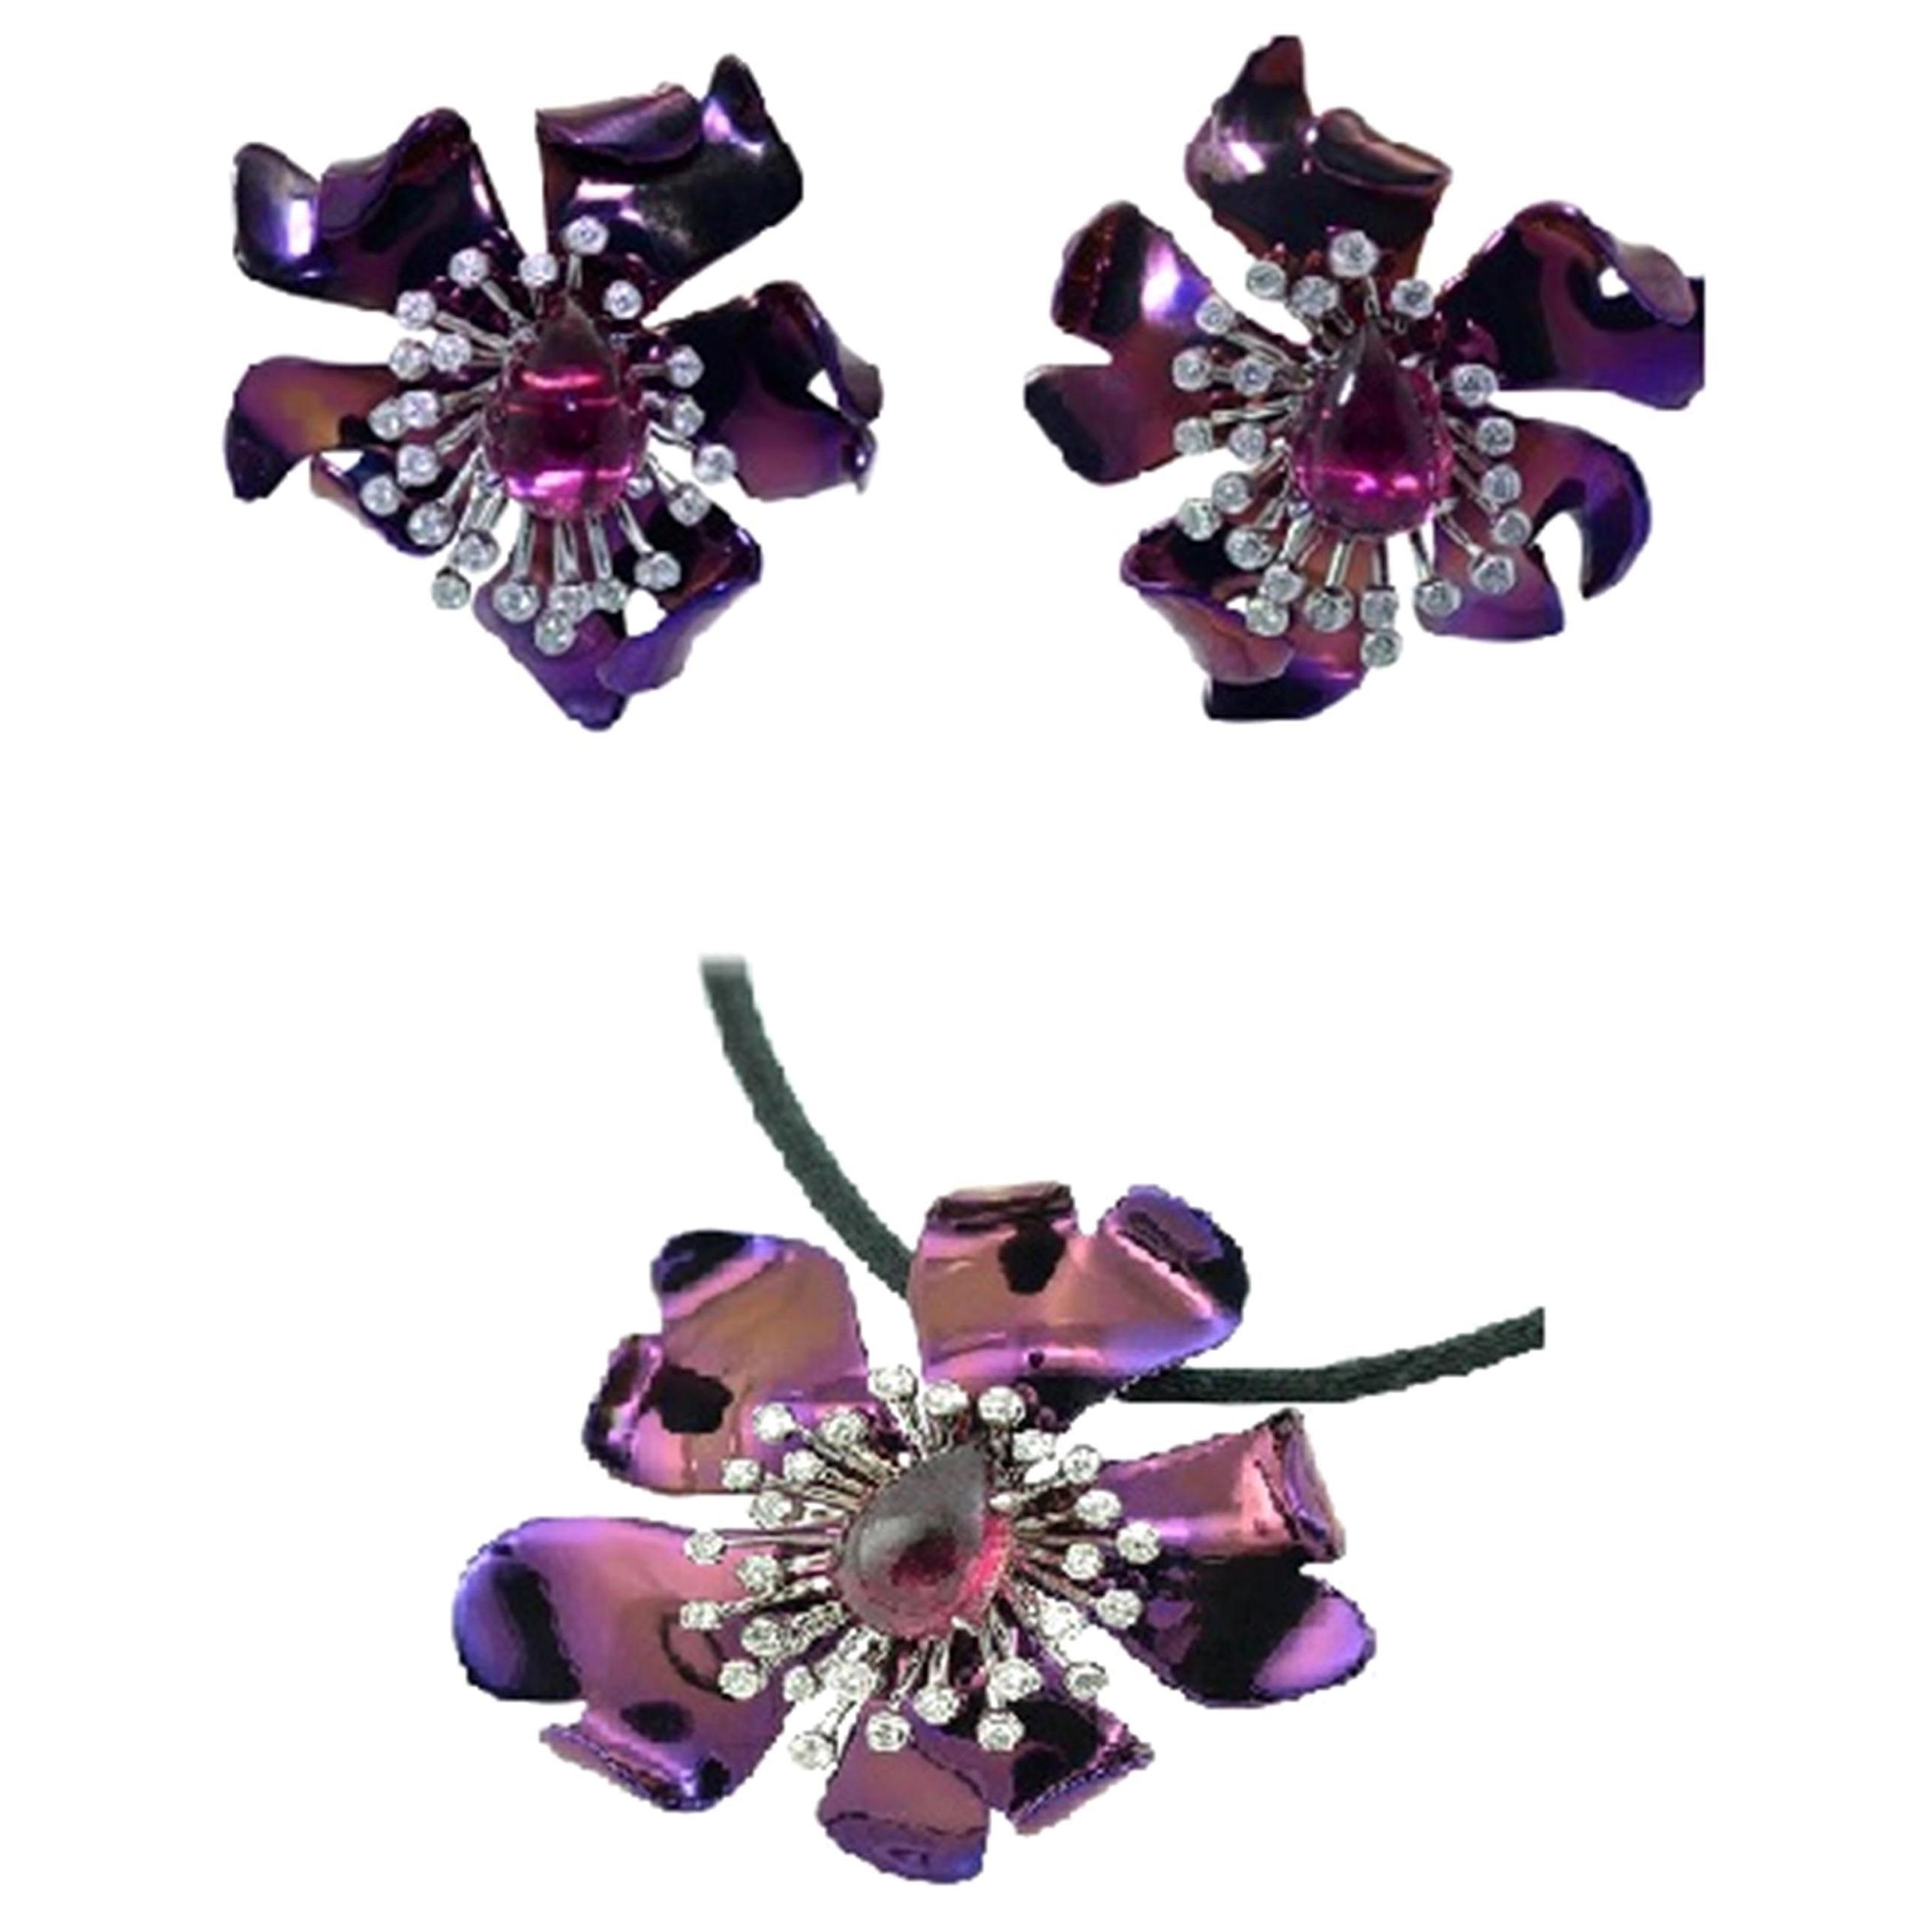 Titanium Diamonds Tourmaline 18 Karat Gold Earrings and Pendant